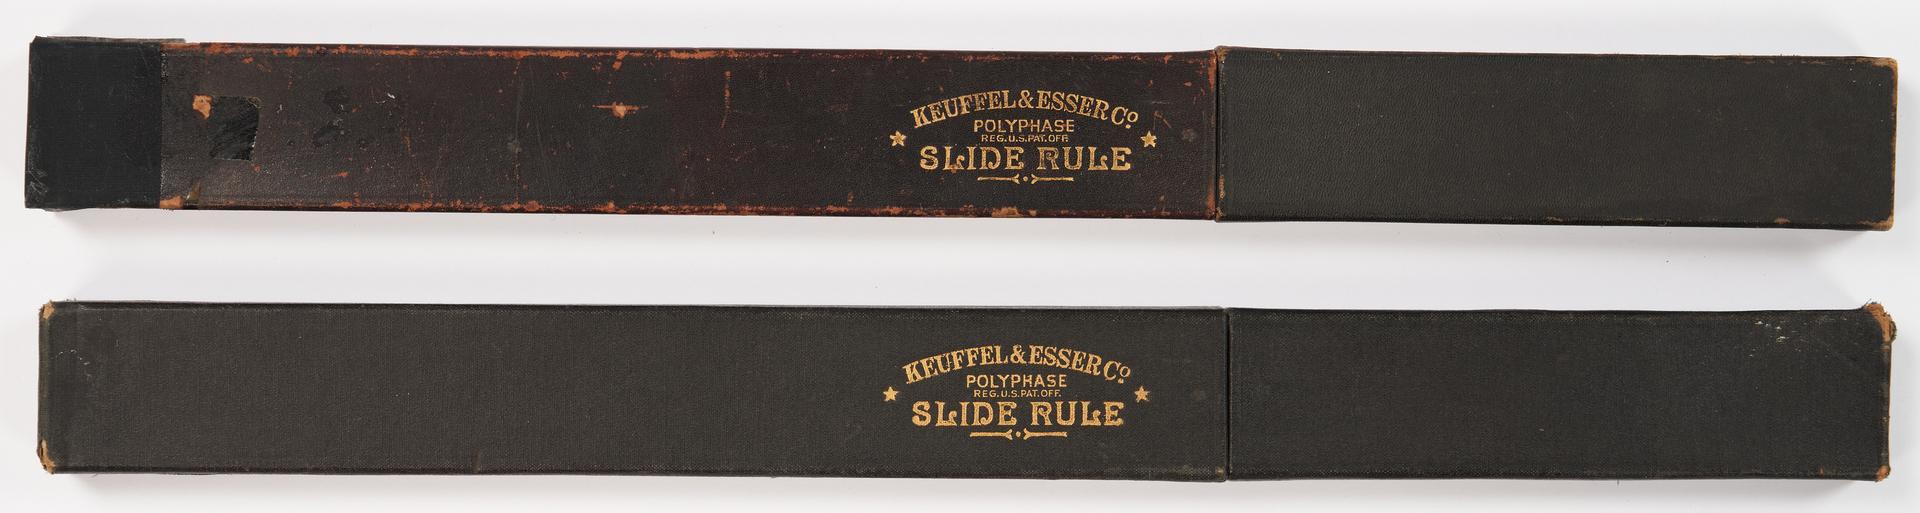 Lot 641: 2 Keuffel & Esser U.S. Military Slide Rules & 6 Others,  8 items